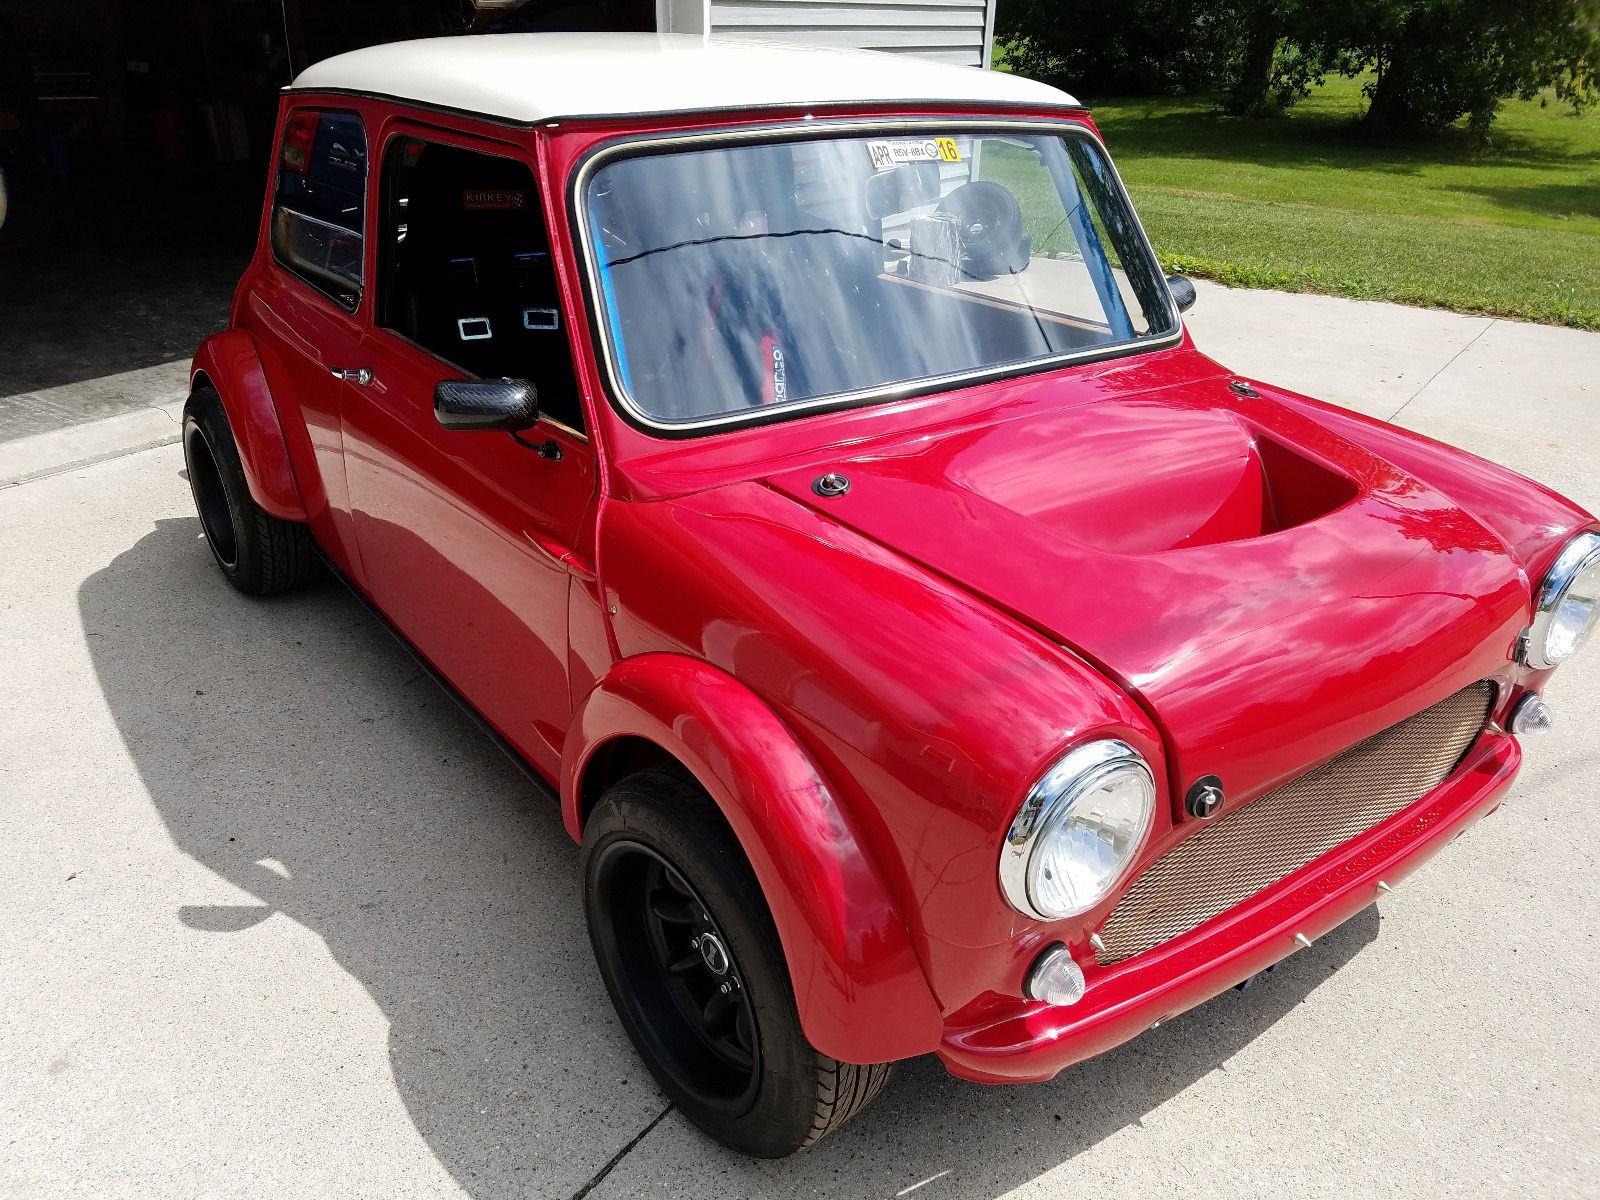 1962 austin mini cooper with an acura engine for sale vehiclejar blog. Black Bedroom Furniture Sets. Home Design Ideas